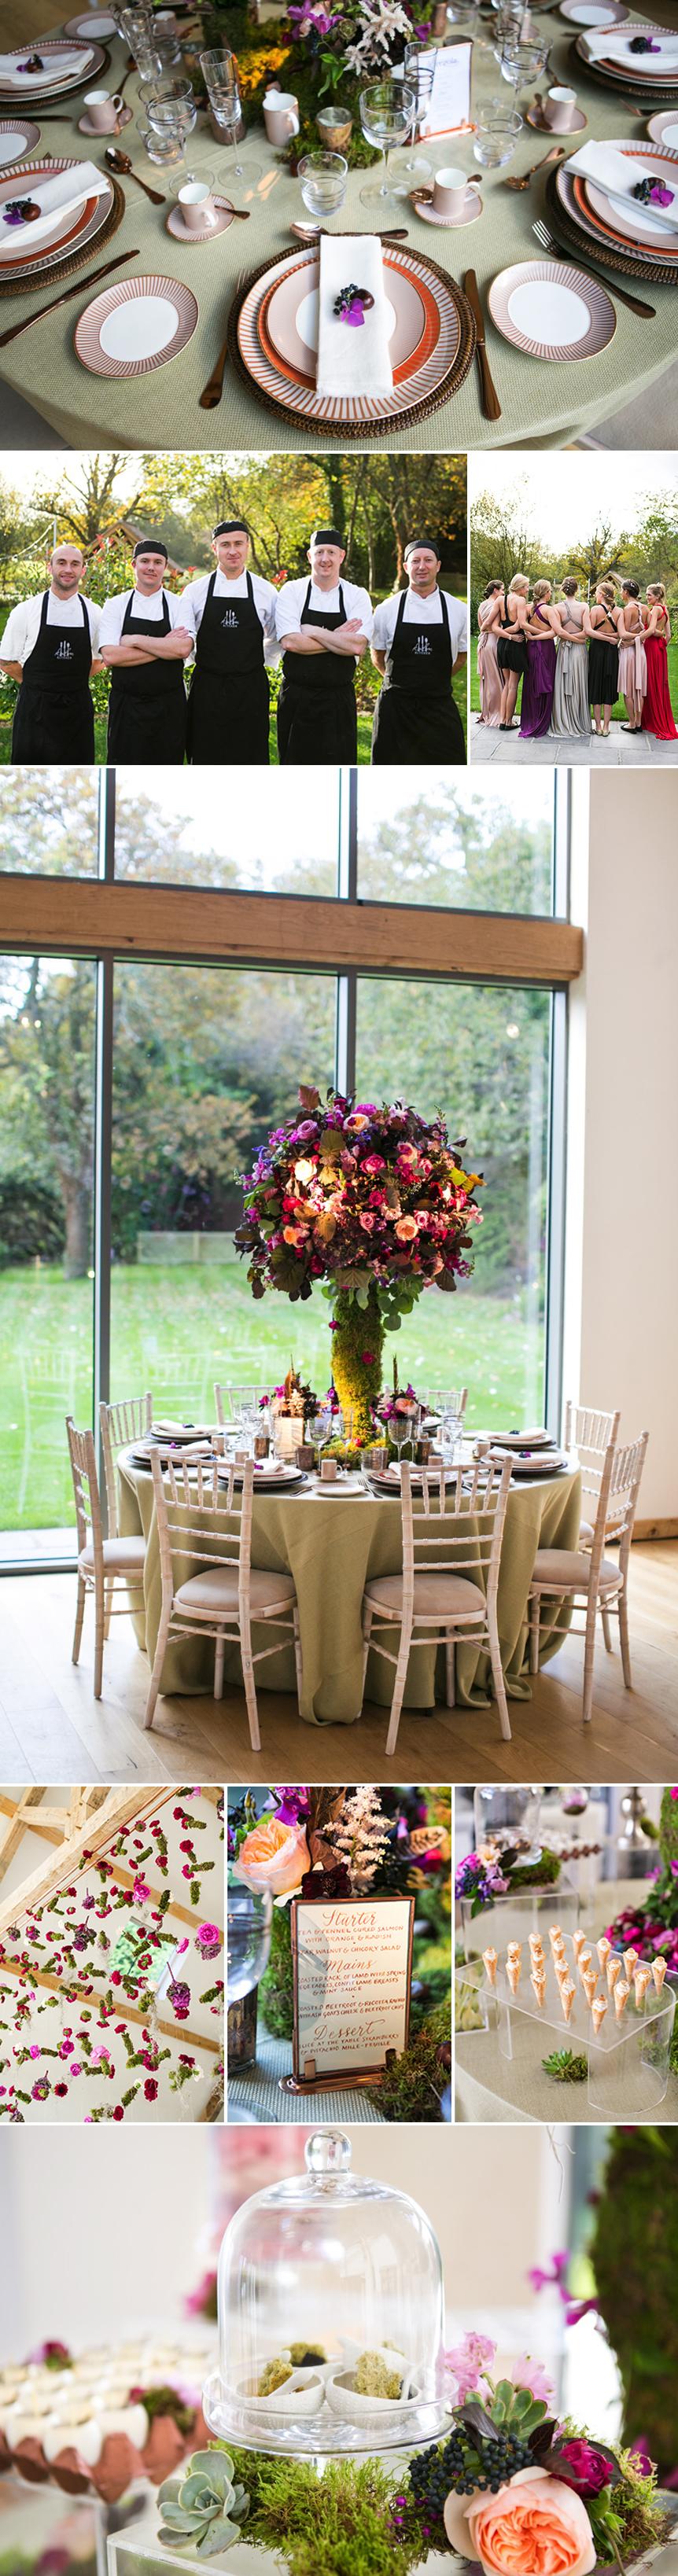 surrey-wedding-venue-millbridge-court-for-coco-wedding-venues-anneli-marinovich-photography-layer-2